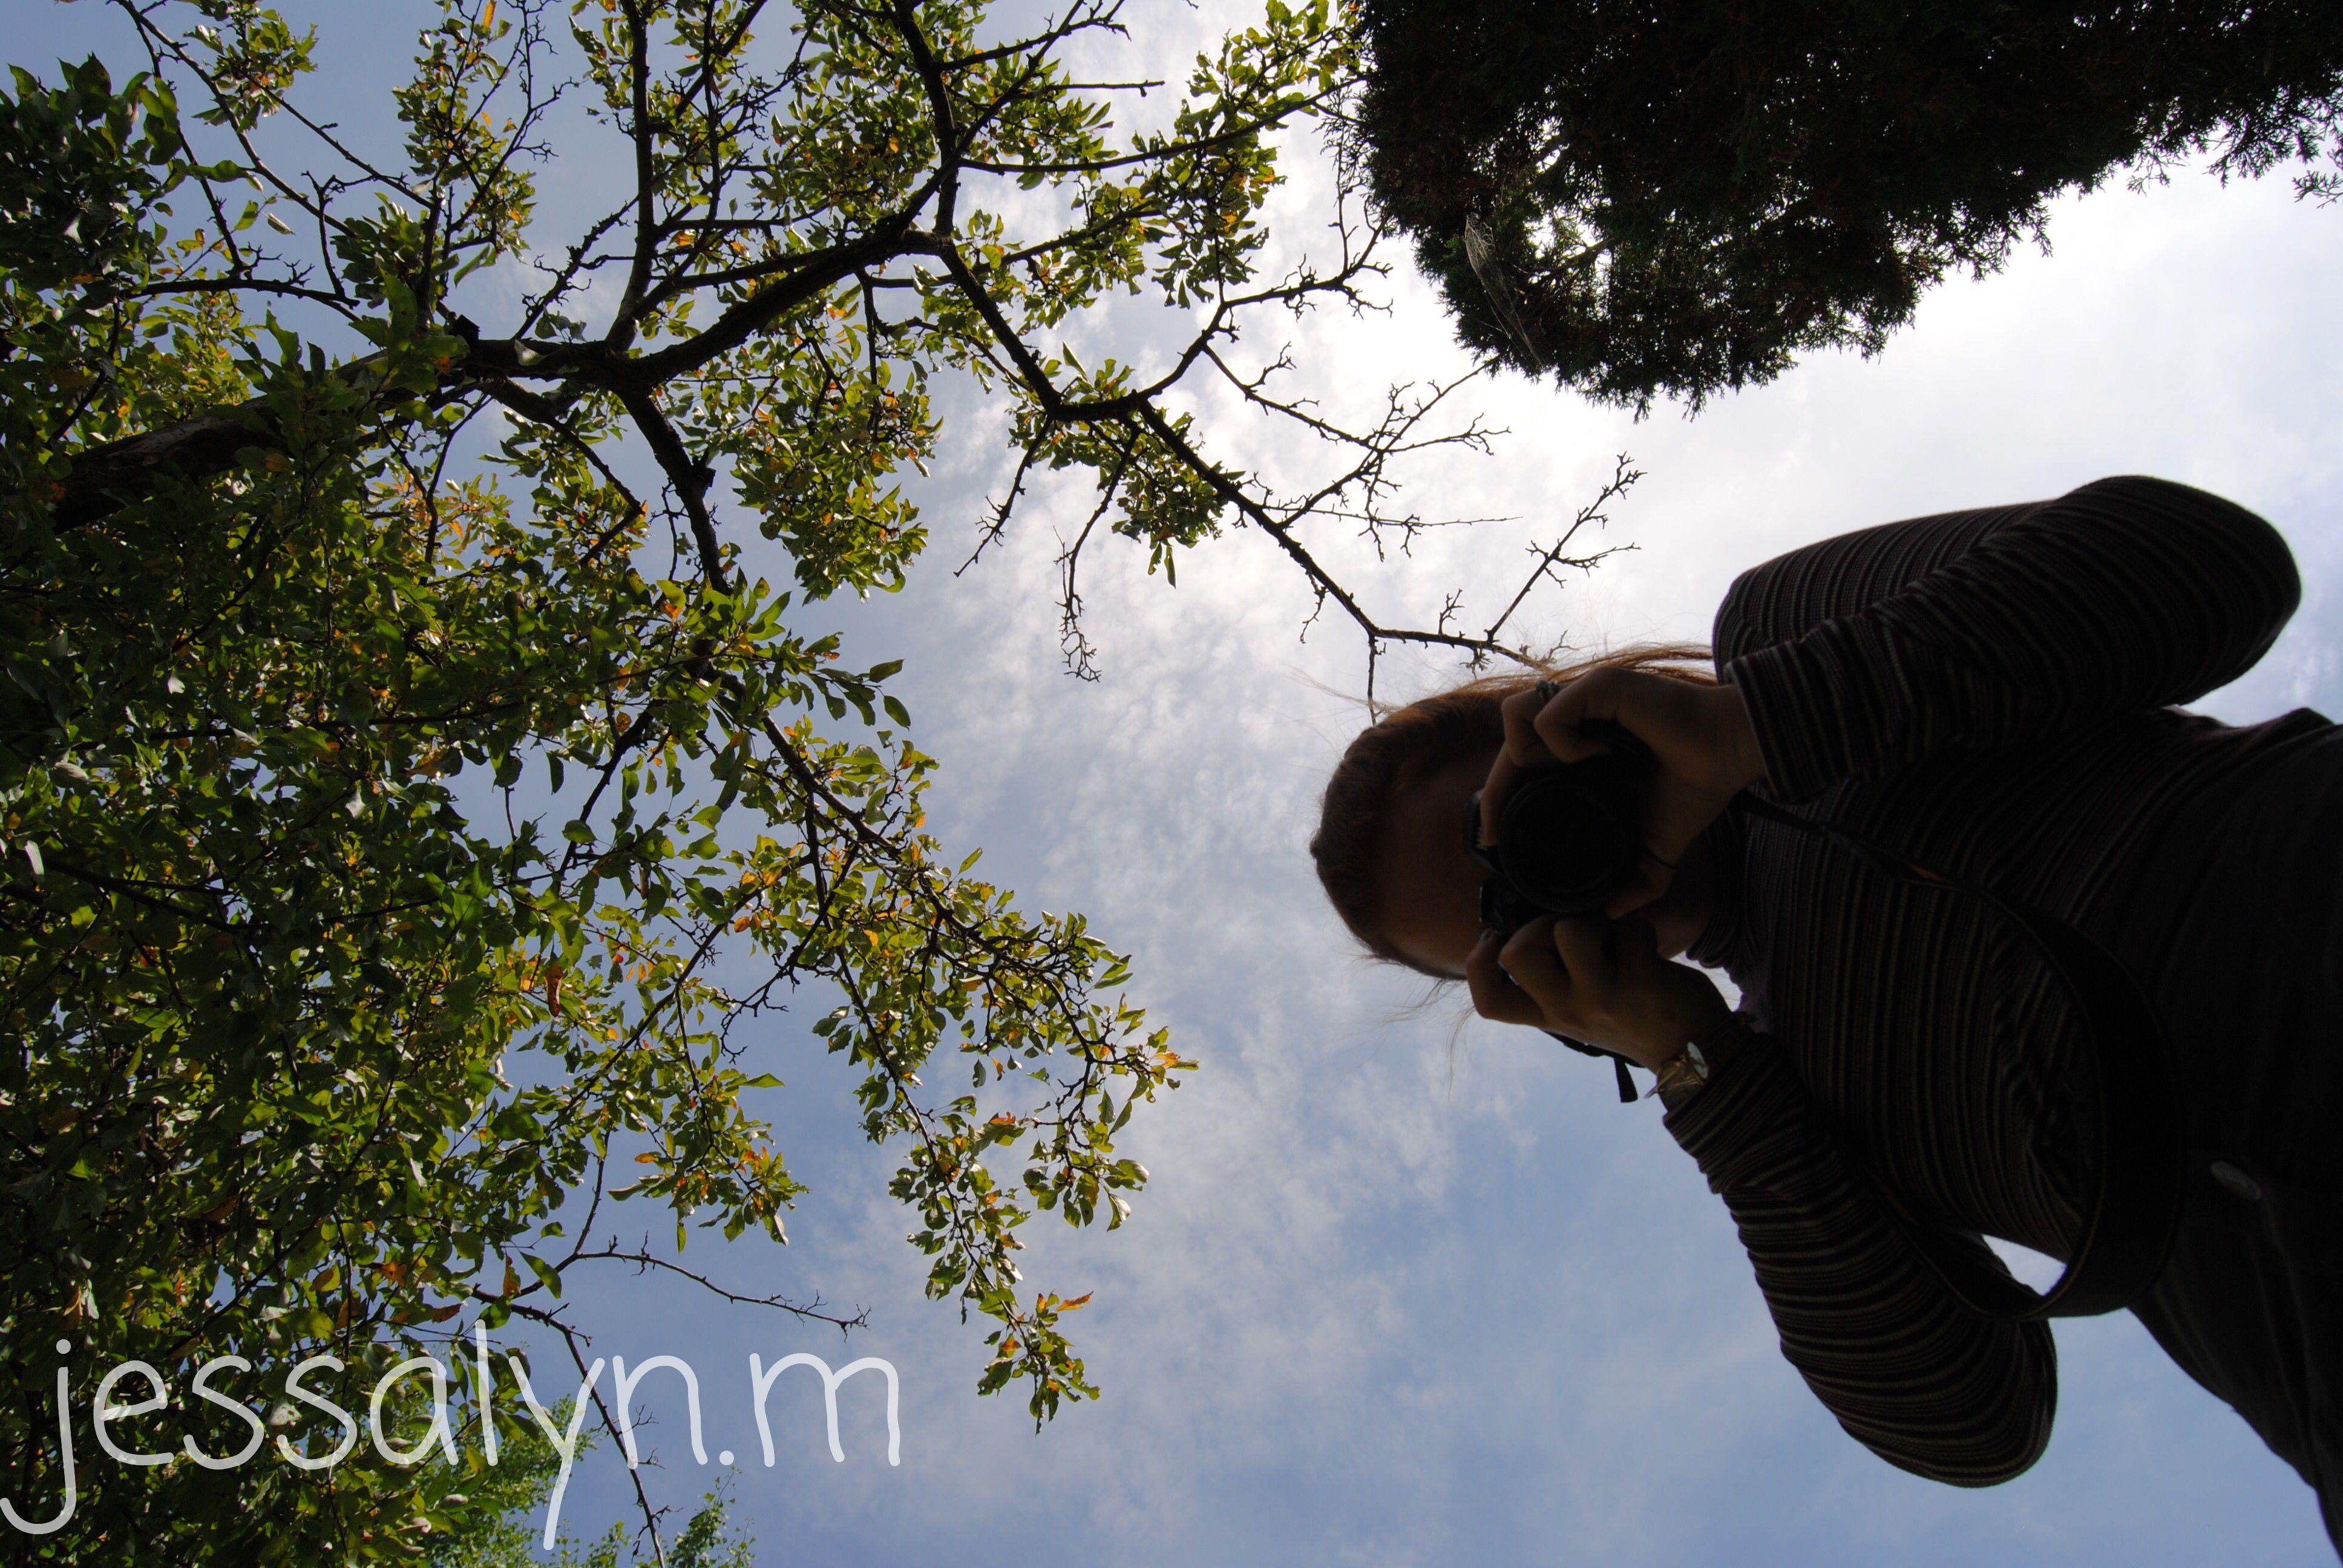 photography ~ jessalyn.m